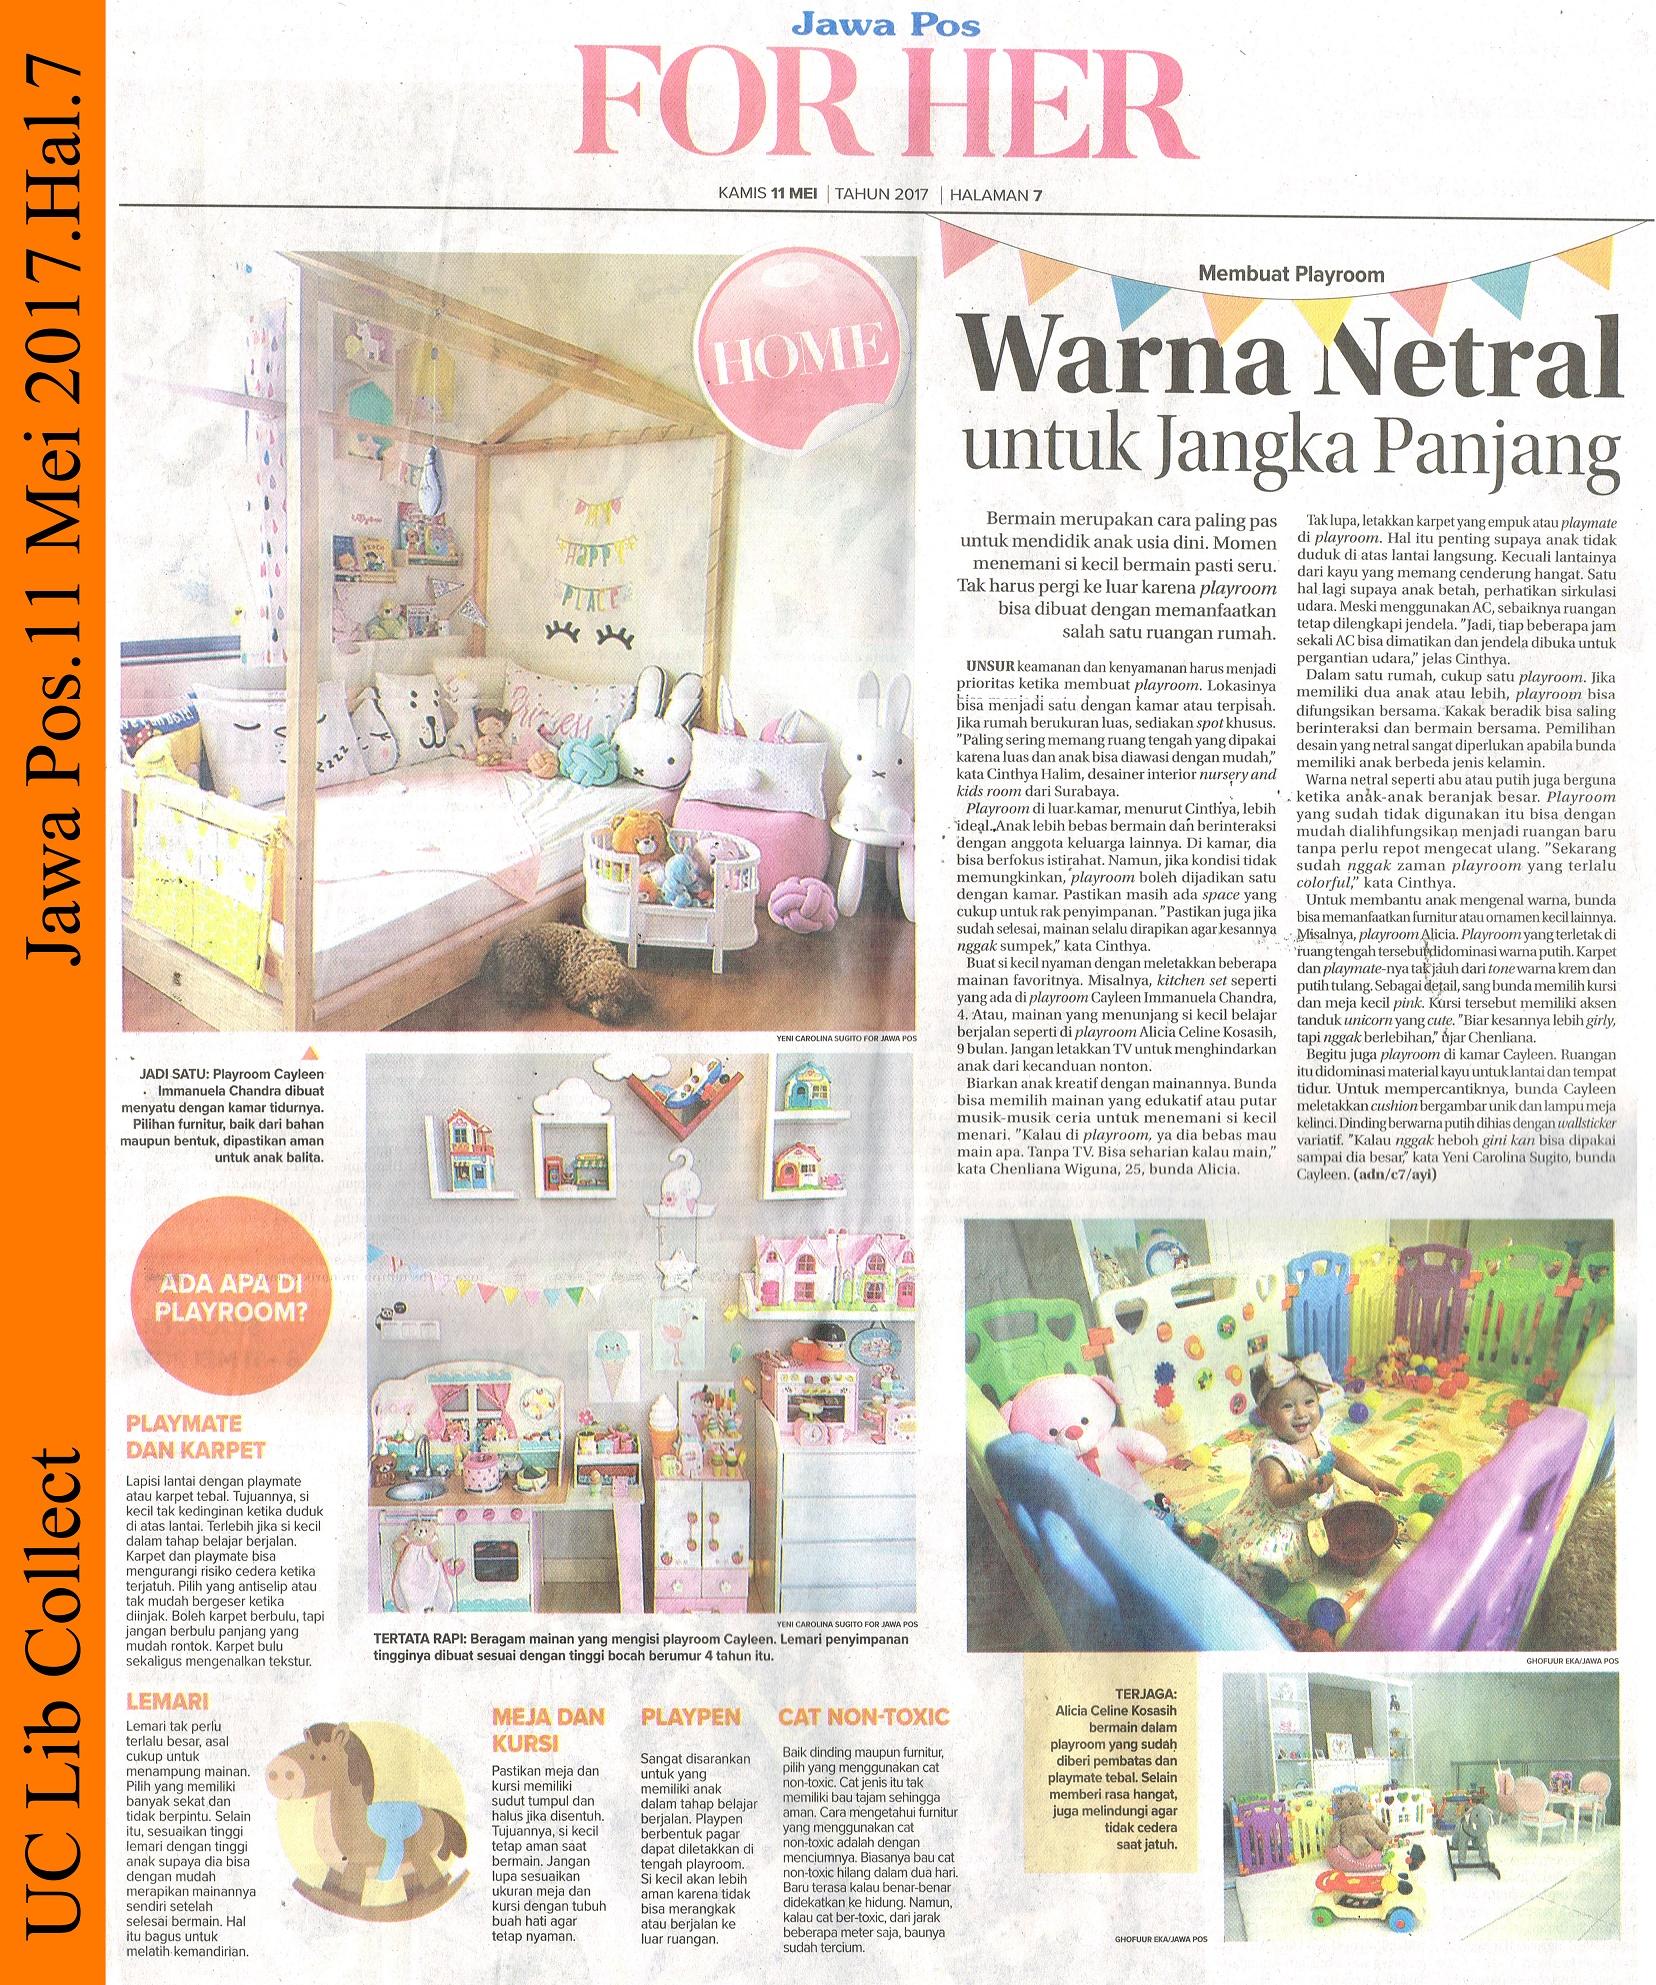 Warna Netral untuk Jangka Panjang. Jawa Pos.11 Mei 2017.Hal.7